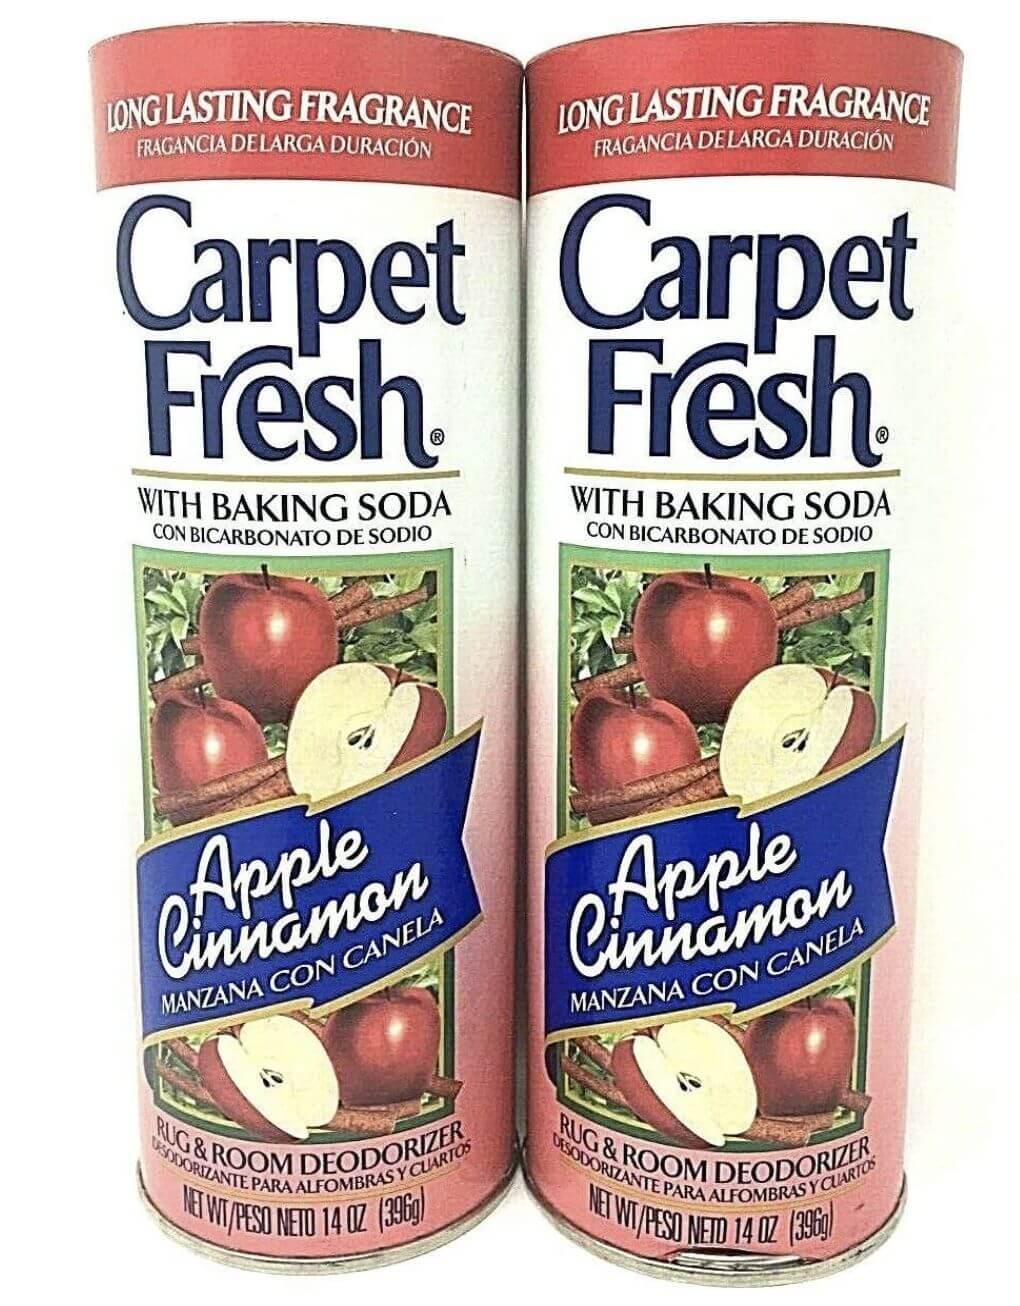 carpet fresh apple cinnamon